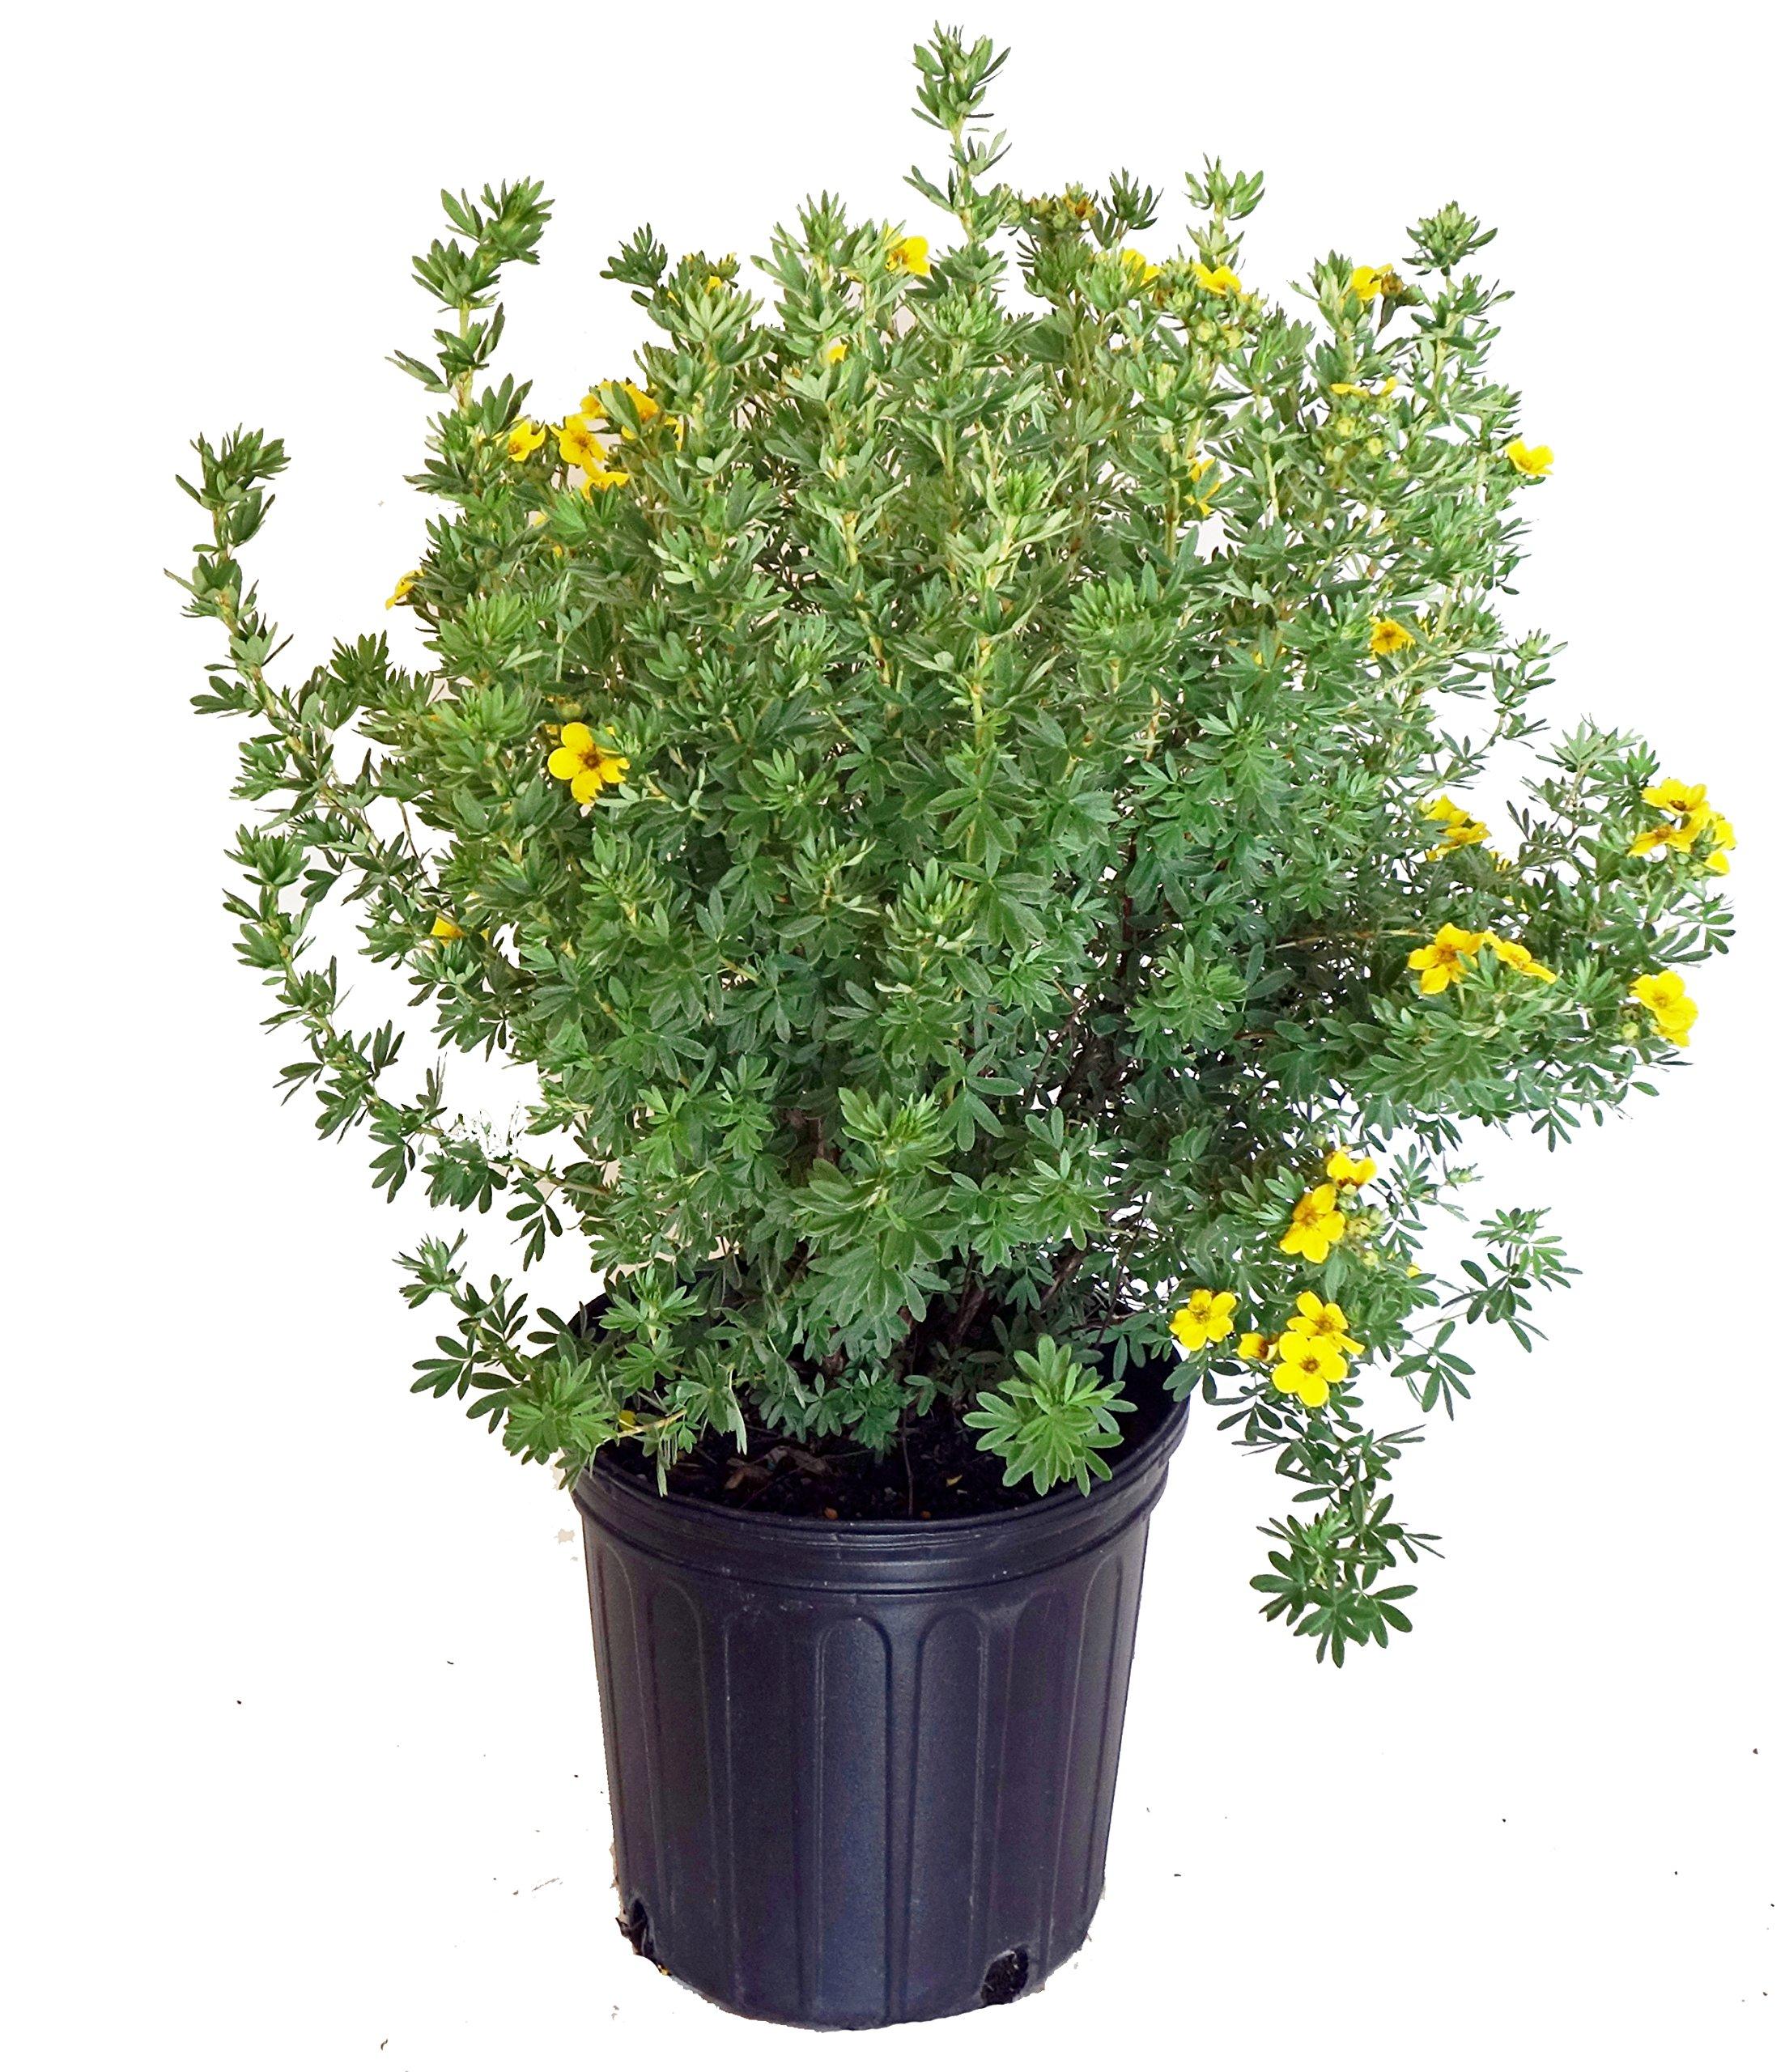 Potentilla frut. 'Gold Finger' (Cinquefoil) Shrub, bright yellow flowers, #3 - Size Container